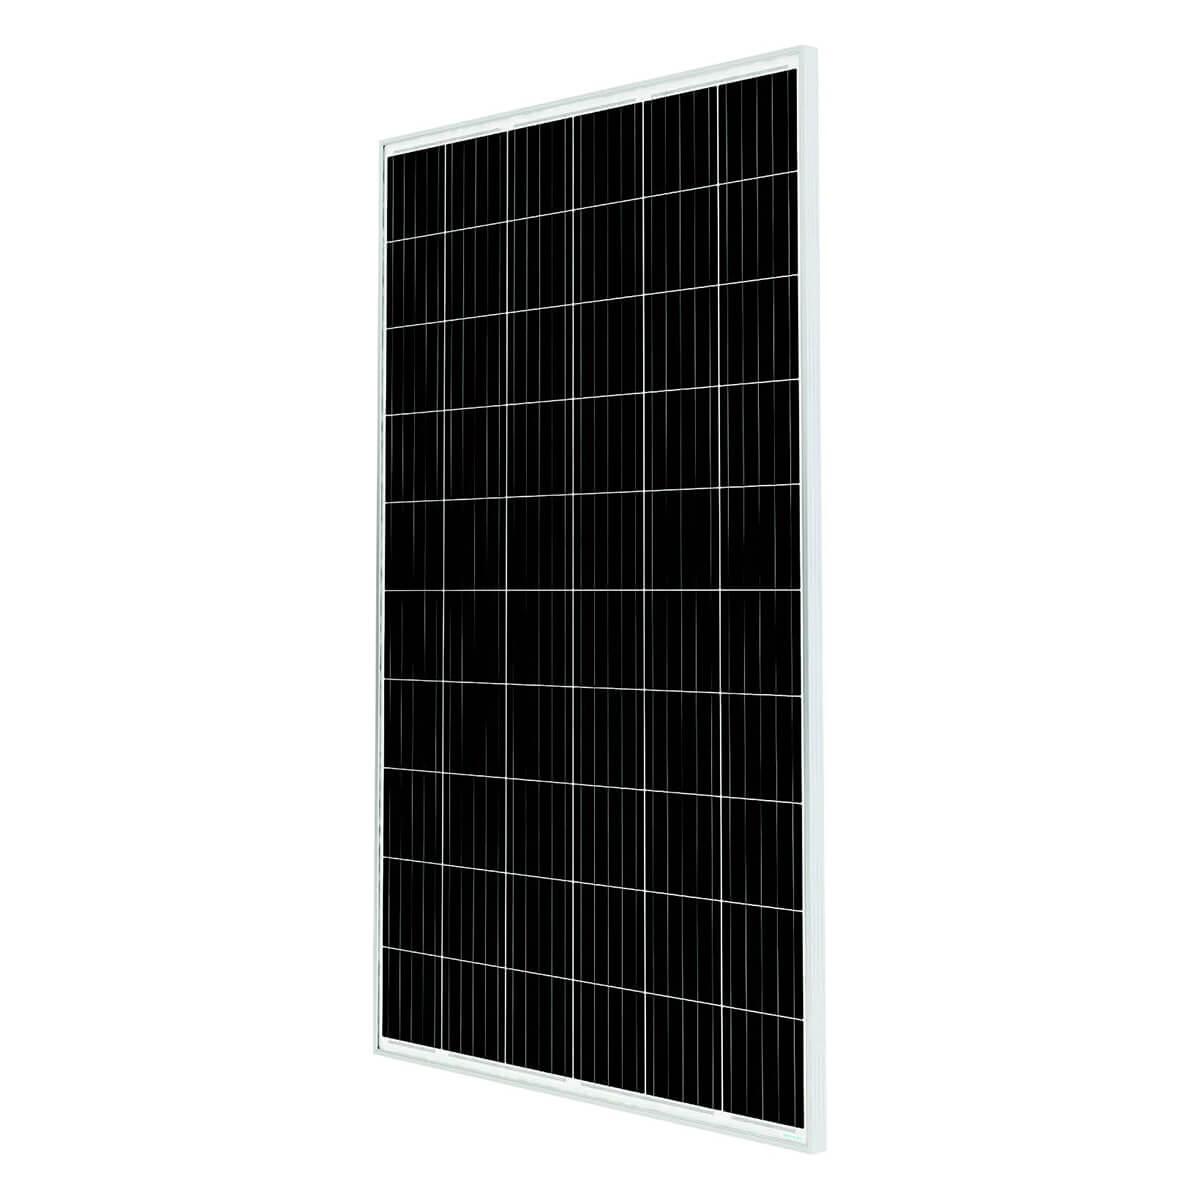 cw enerji 320W panel, cw enerji 320Watt panel, cw enerji 320 W panel, cw enerji 320 Watt panel, cw enerji 320 Watt monokristal panel, cw enerji 320 W watt gunes paneli, cw enerji 320 W watt monokristal gunes paneli, cw enerji 320 W Watt fotovoltaik monokristal solar panel, cw enerji 320W monokristal gunes enerjisi, cw enerji CWT320-60PM-320W panel, CW Enerji 320 WATT